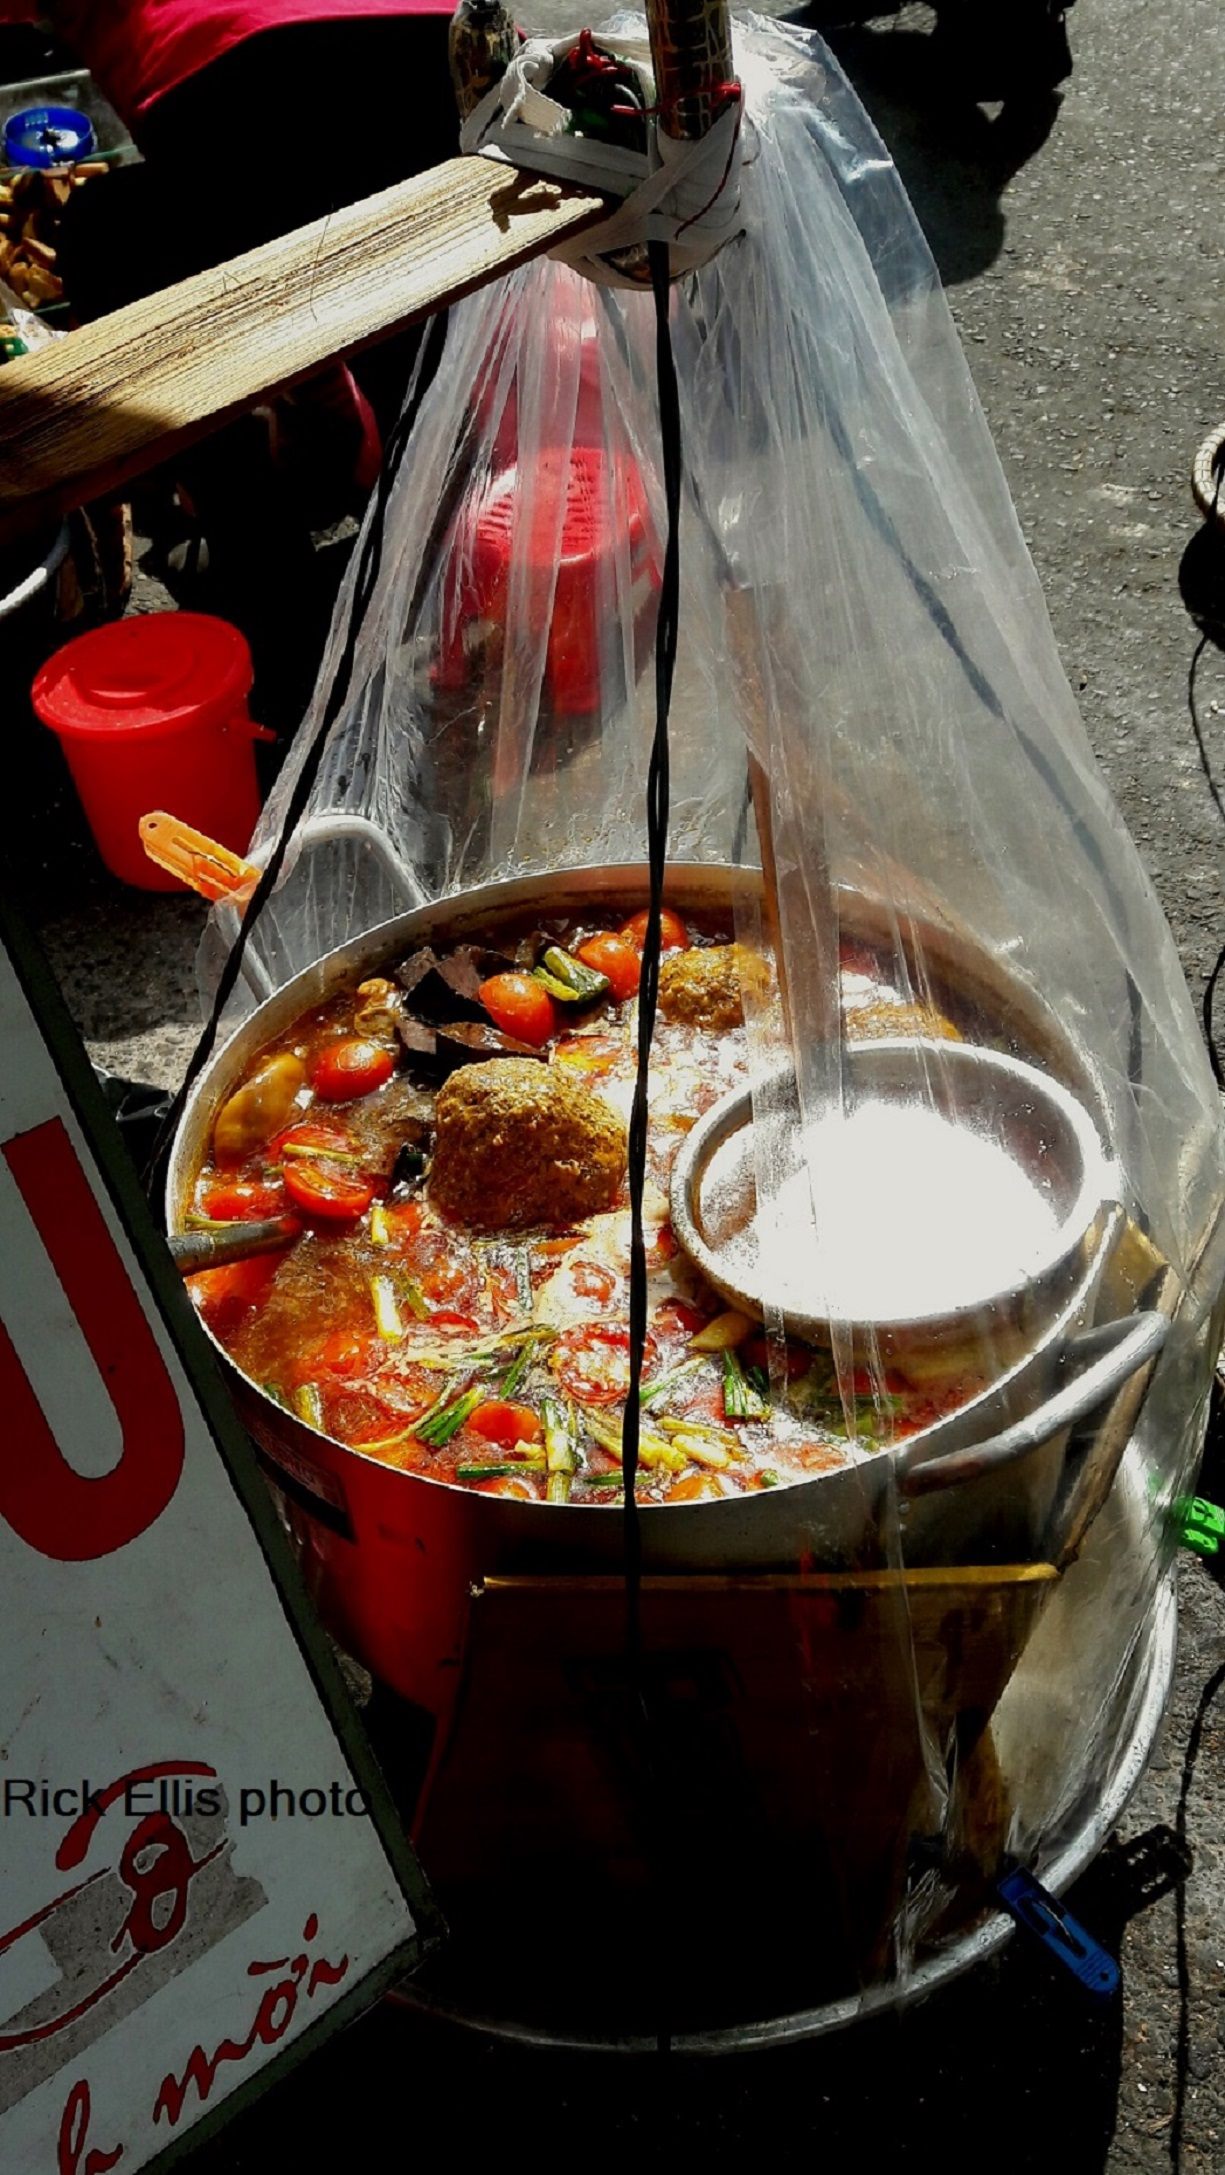 A hawker's pot of bún riêu cua (crab and tomato noodle soup) in Da Lat City, Lam Dong Province, Vietnam. Photo: Rick Ellis